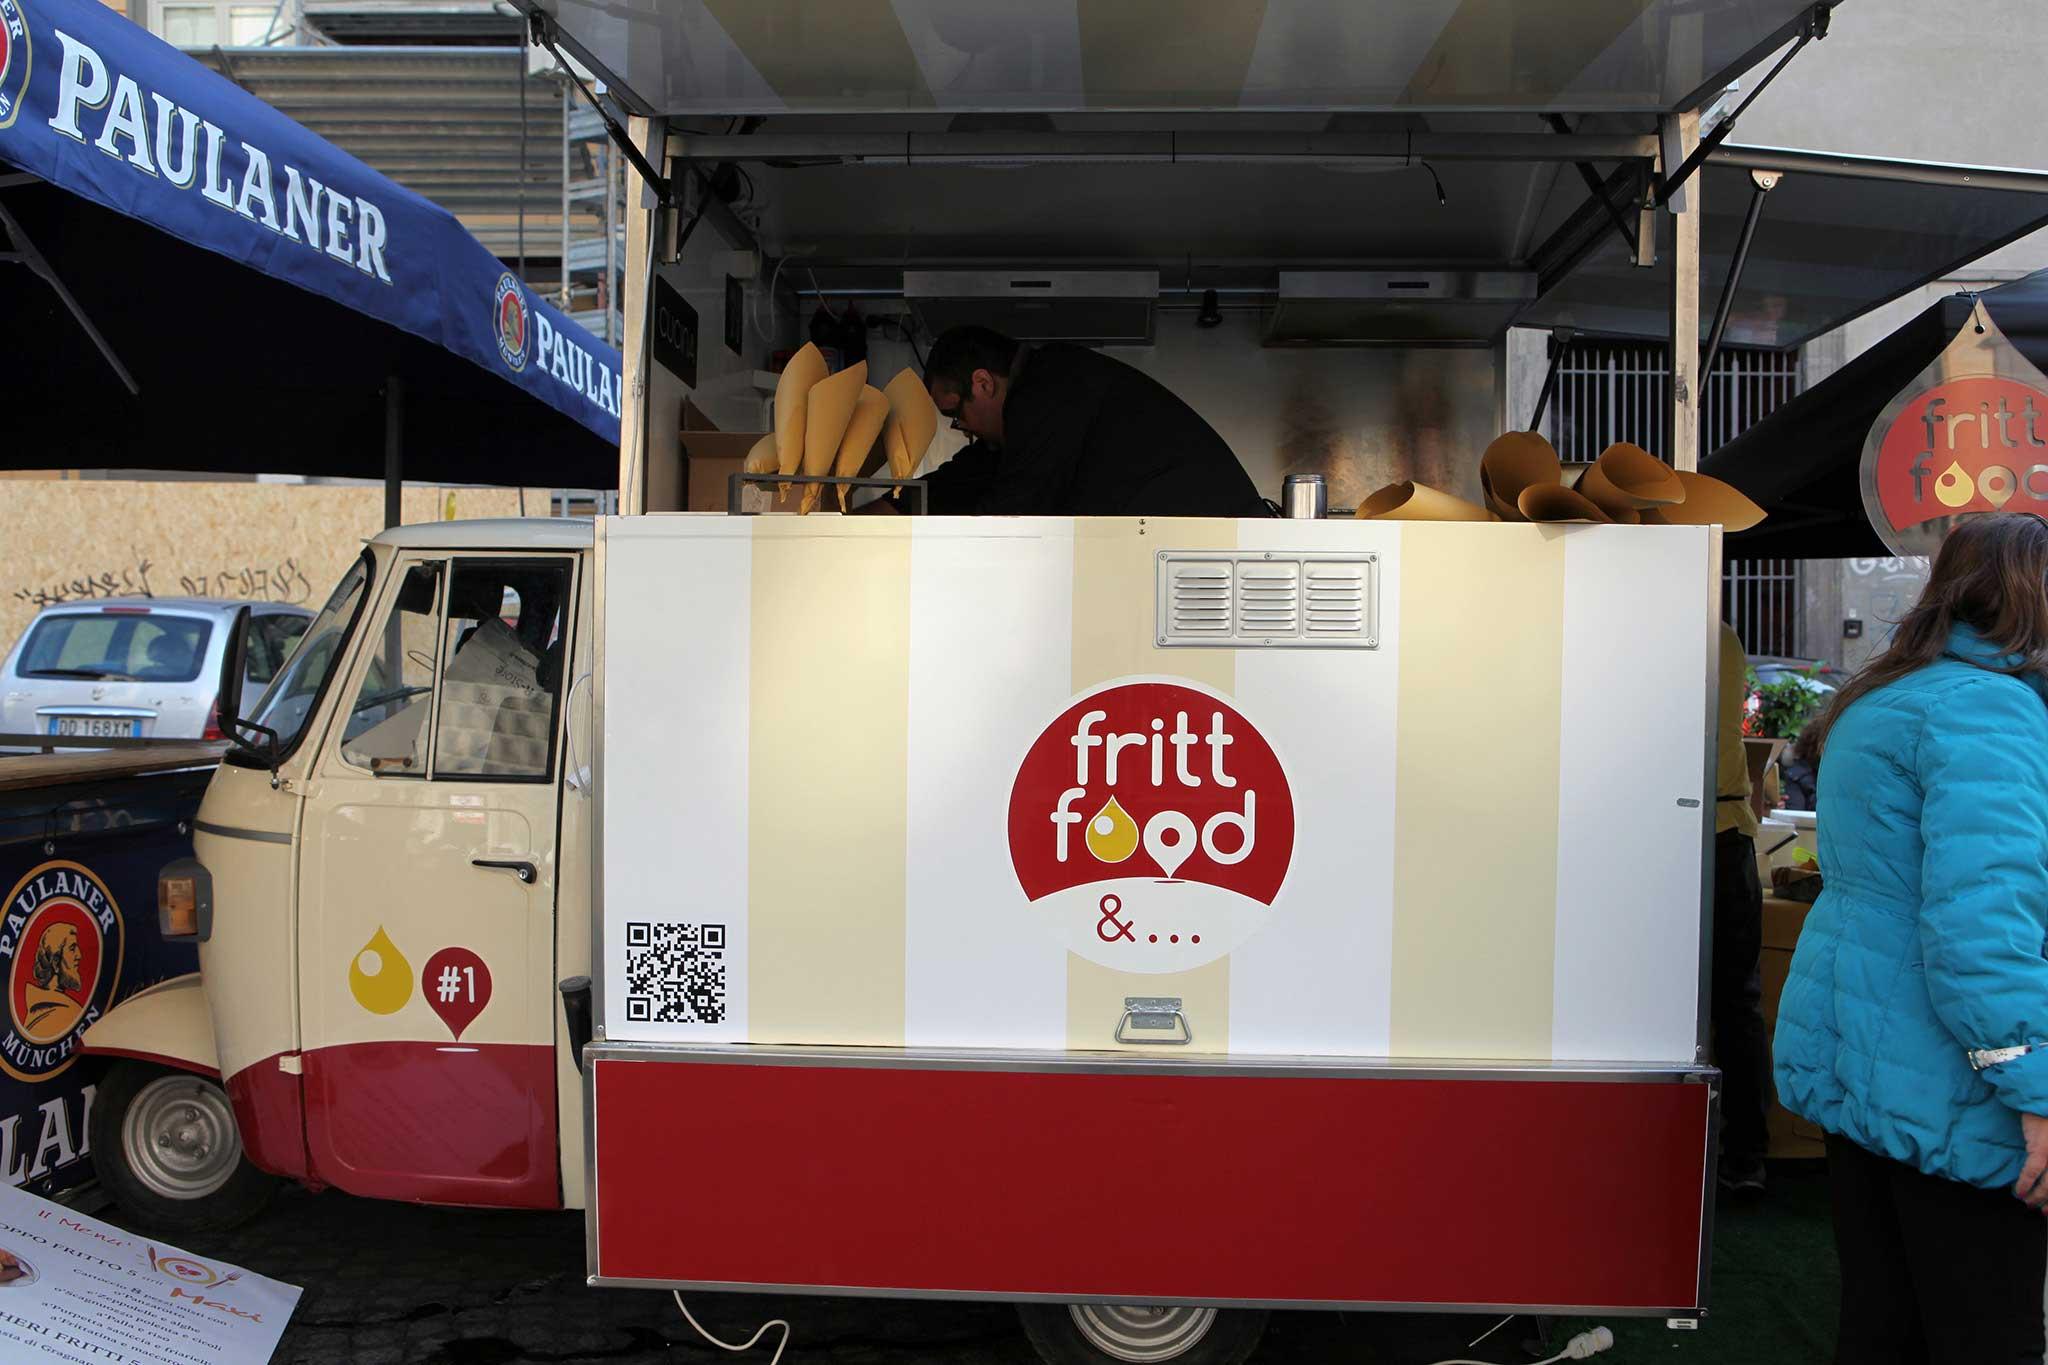 Fritt strit food